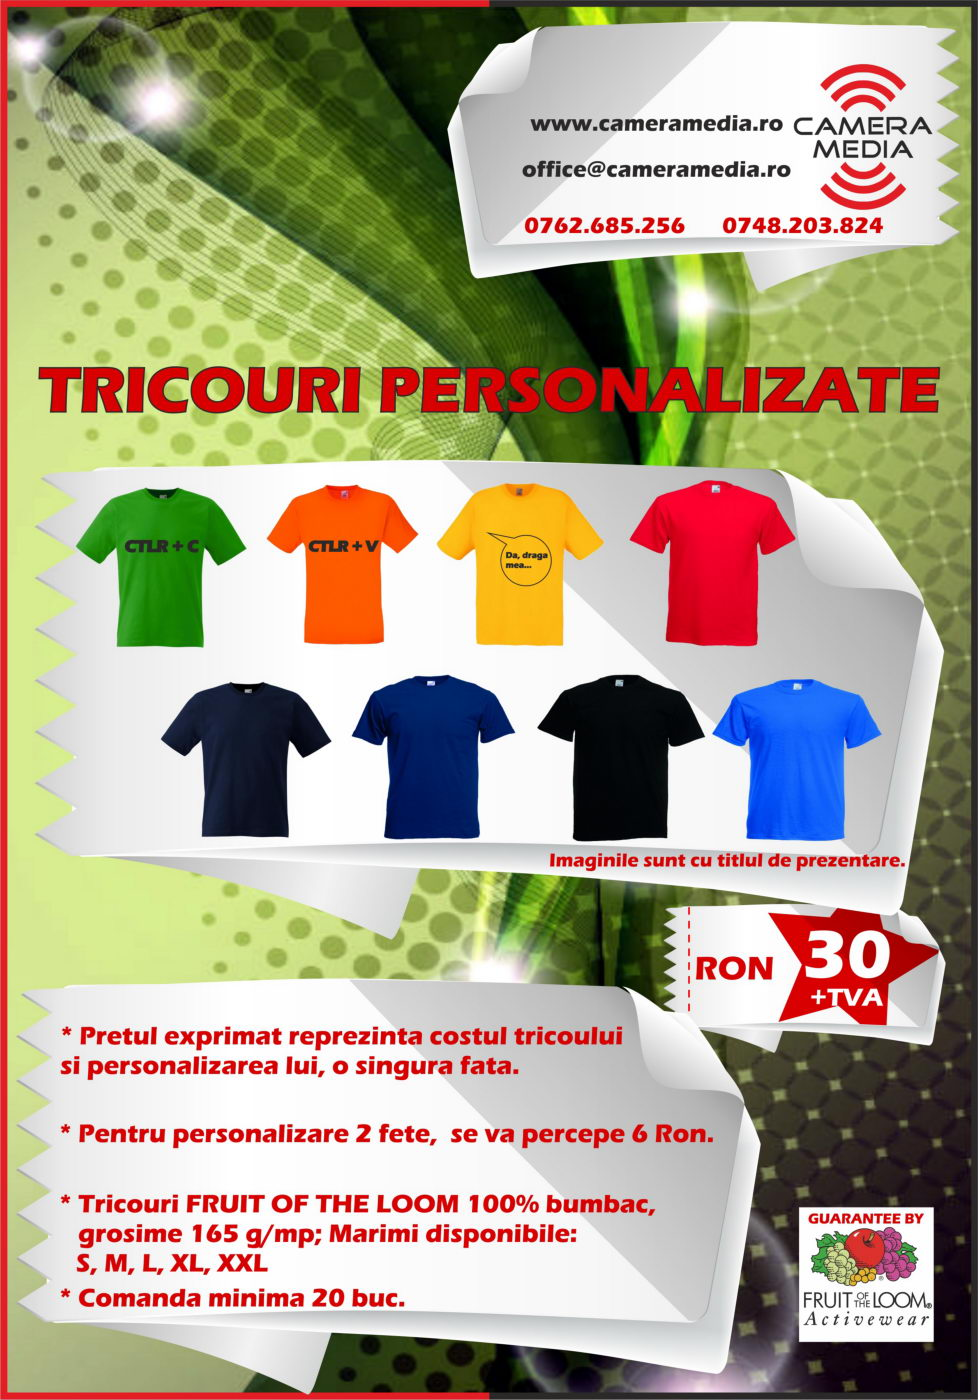 Ofreta Tricou Personalizat Maneca Scurta Fruit of the Loom